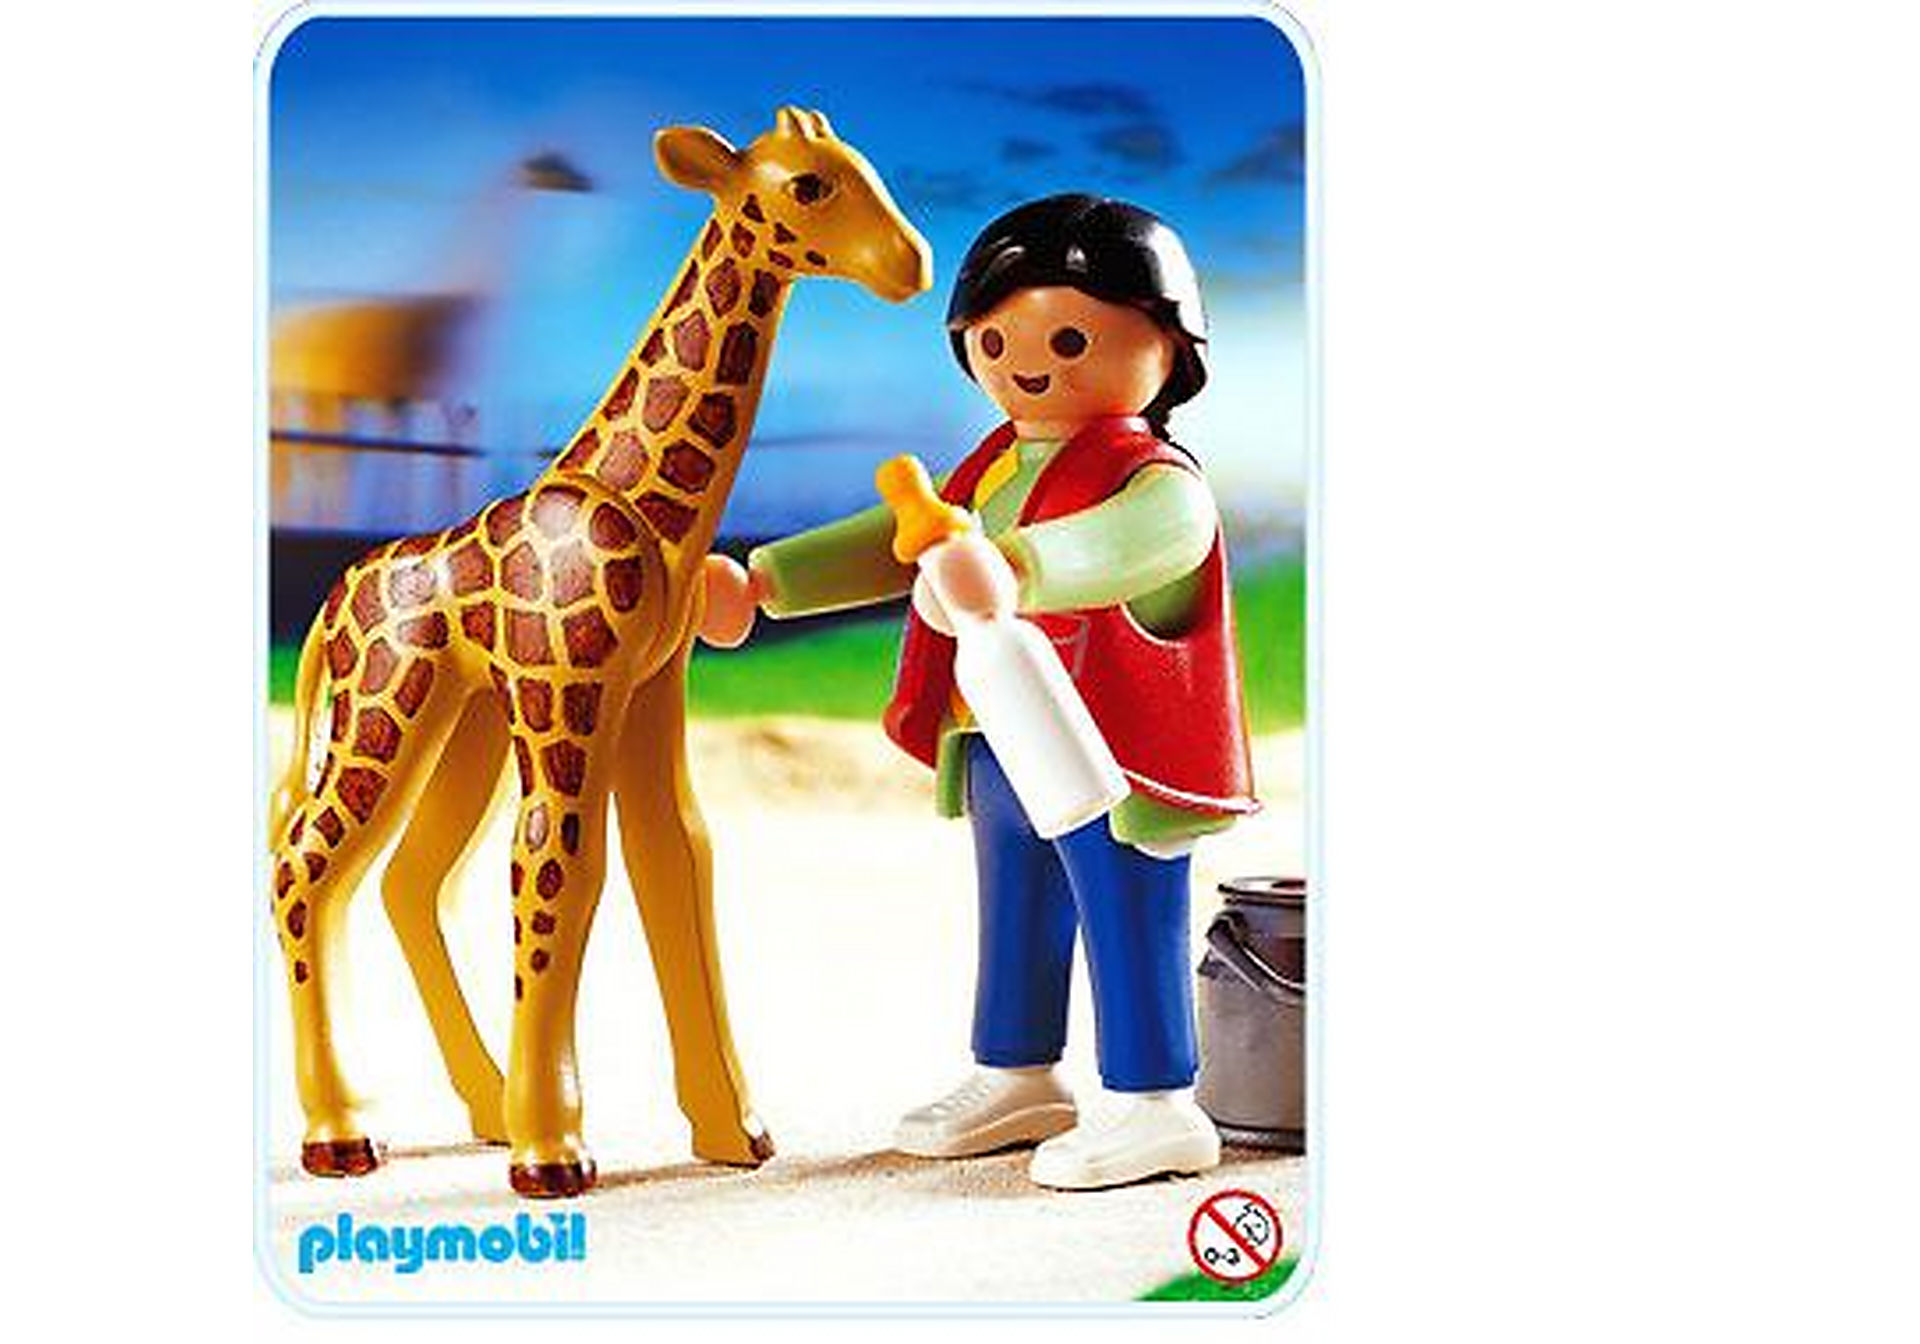 http://media.playmobil.com/i/playmobil/3253-B_product_detail/Gardienne de zoo / girafon